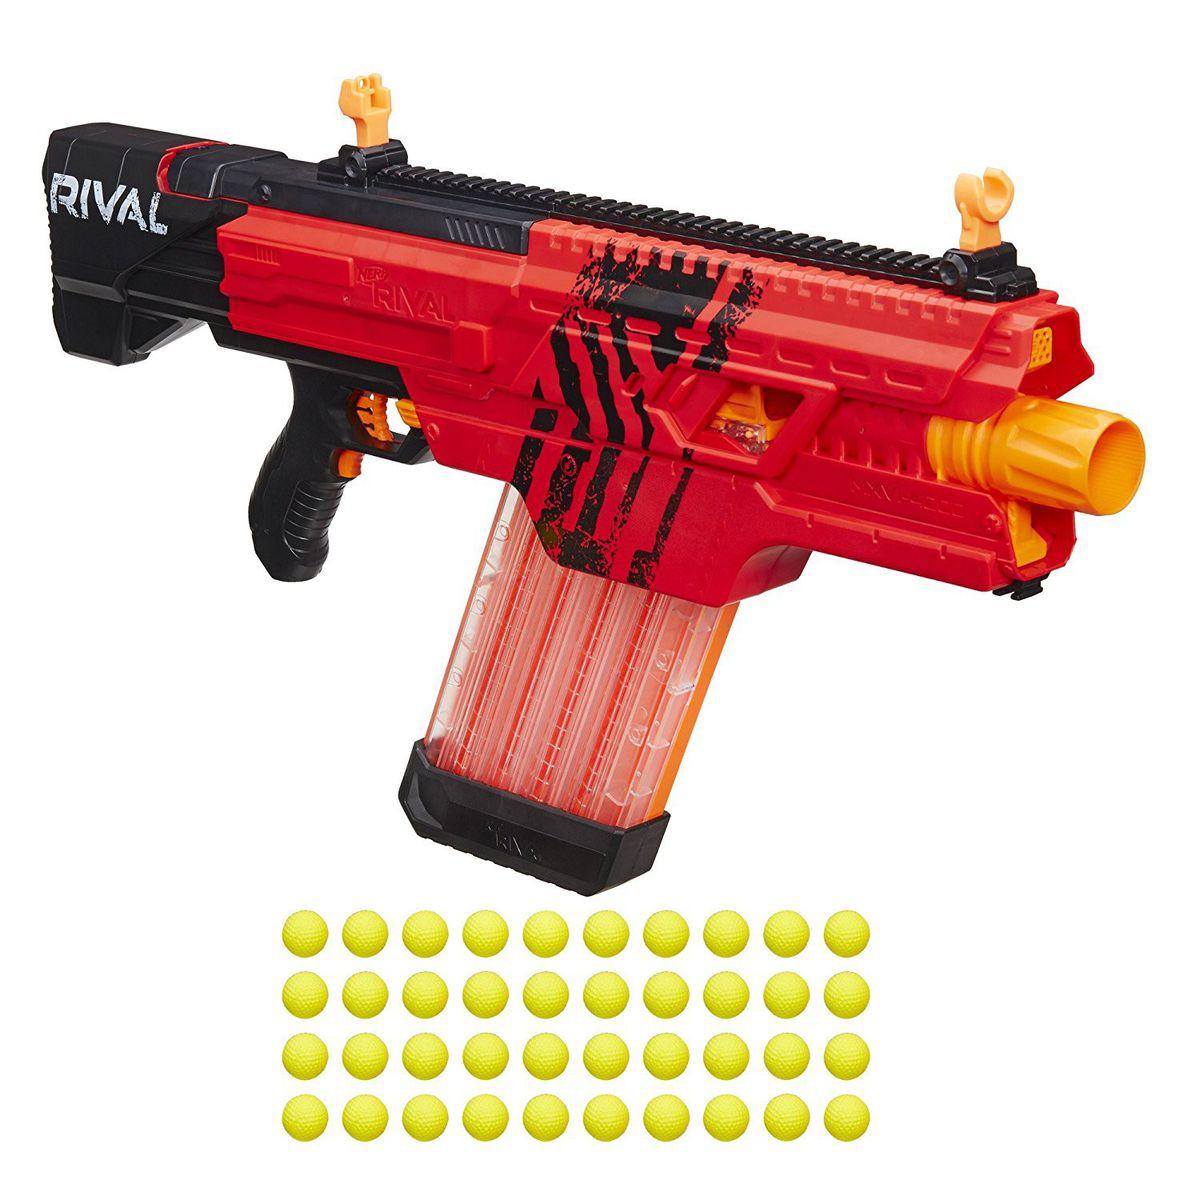 Nerf Rival Khaos Gun MXVI-4000 Blaster Boys Toy - Red (Parallel Import).  Loading zoom